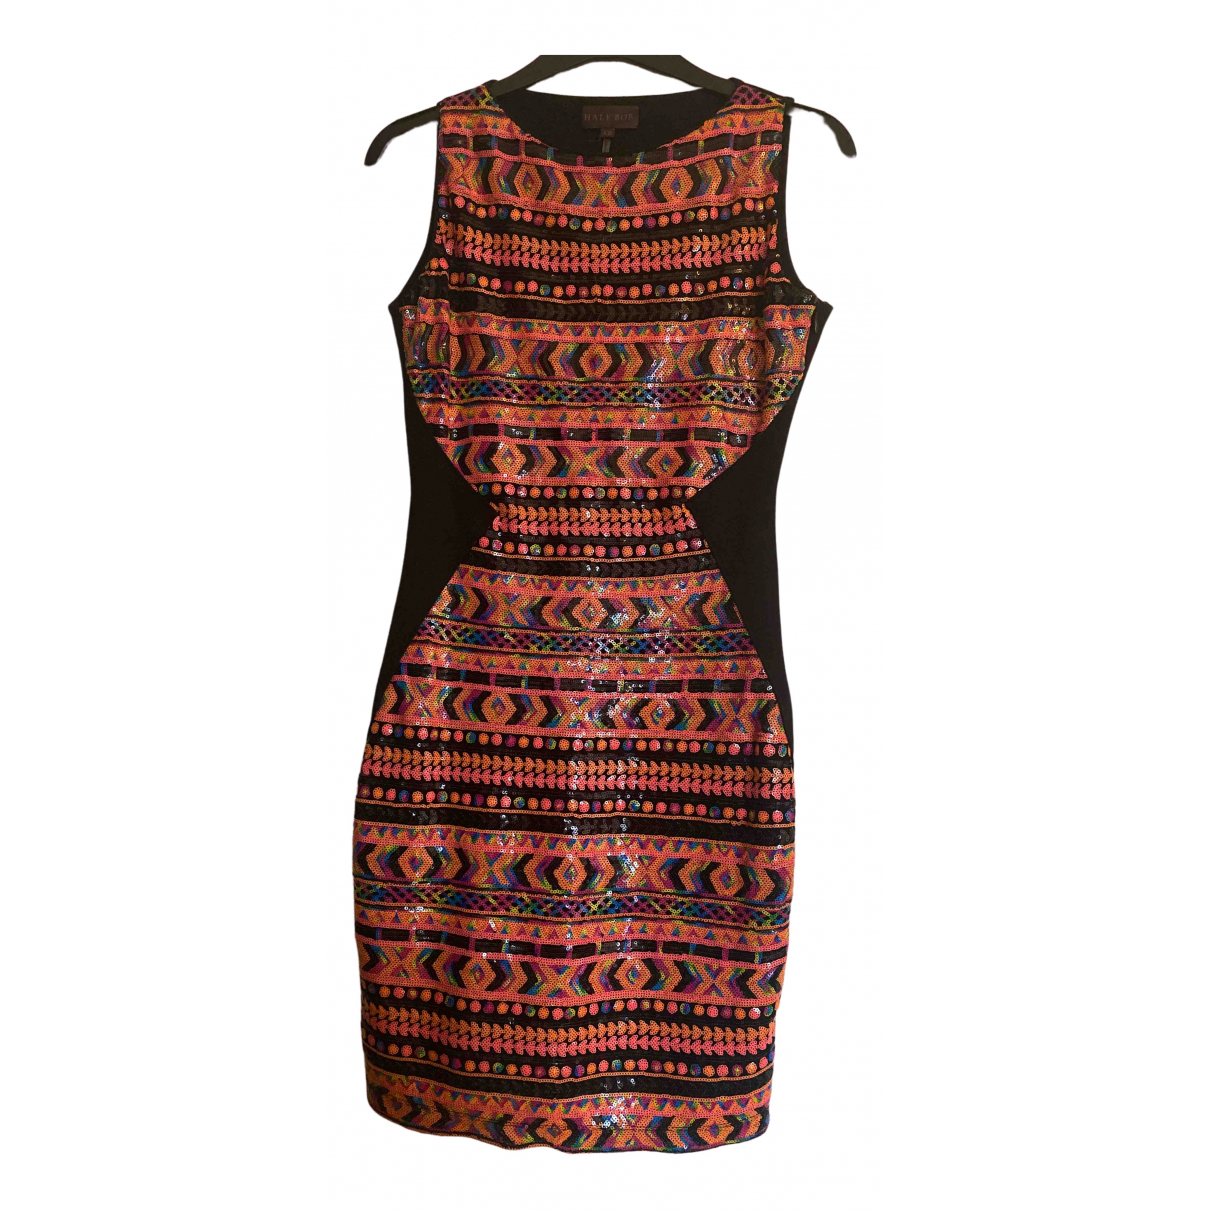 Hale Bob N Multicolour Glitter dress for Women XS International